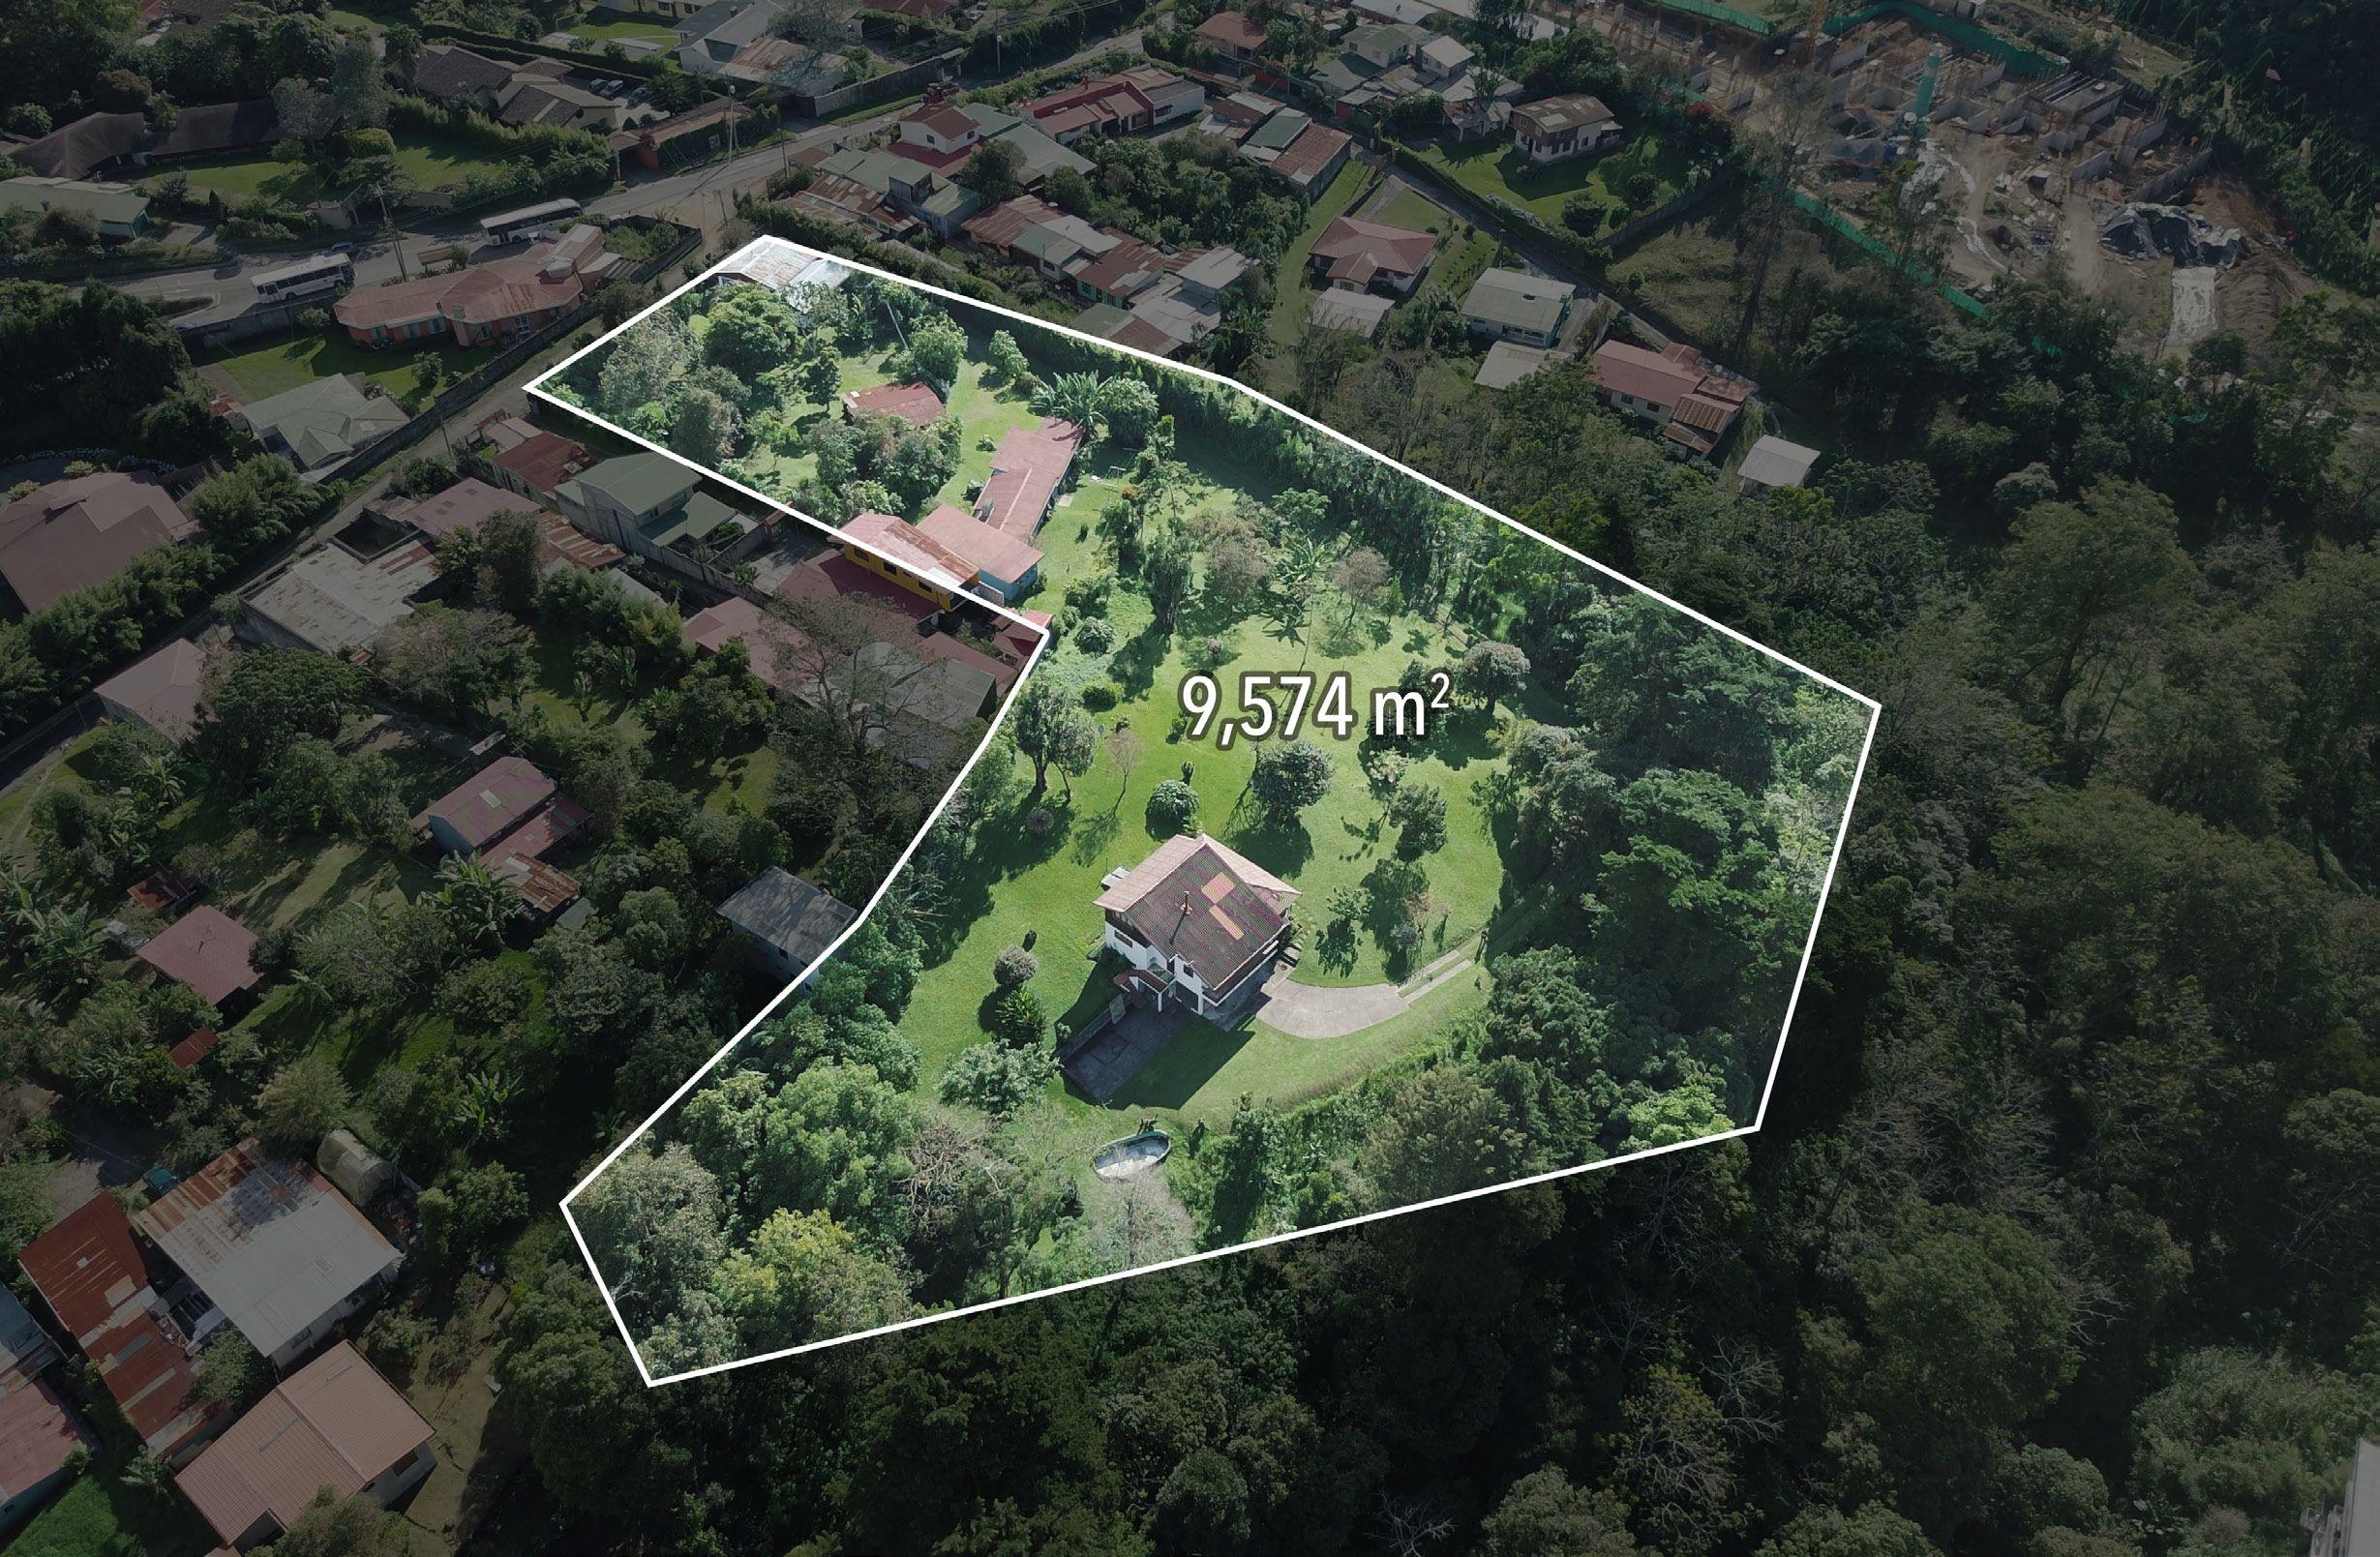 3-Acre Property for Sale, Ideal for Condo Development, San Rafael, Montes de Oca